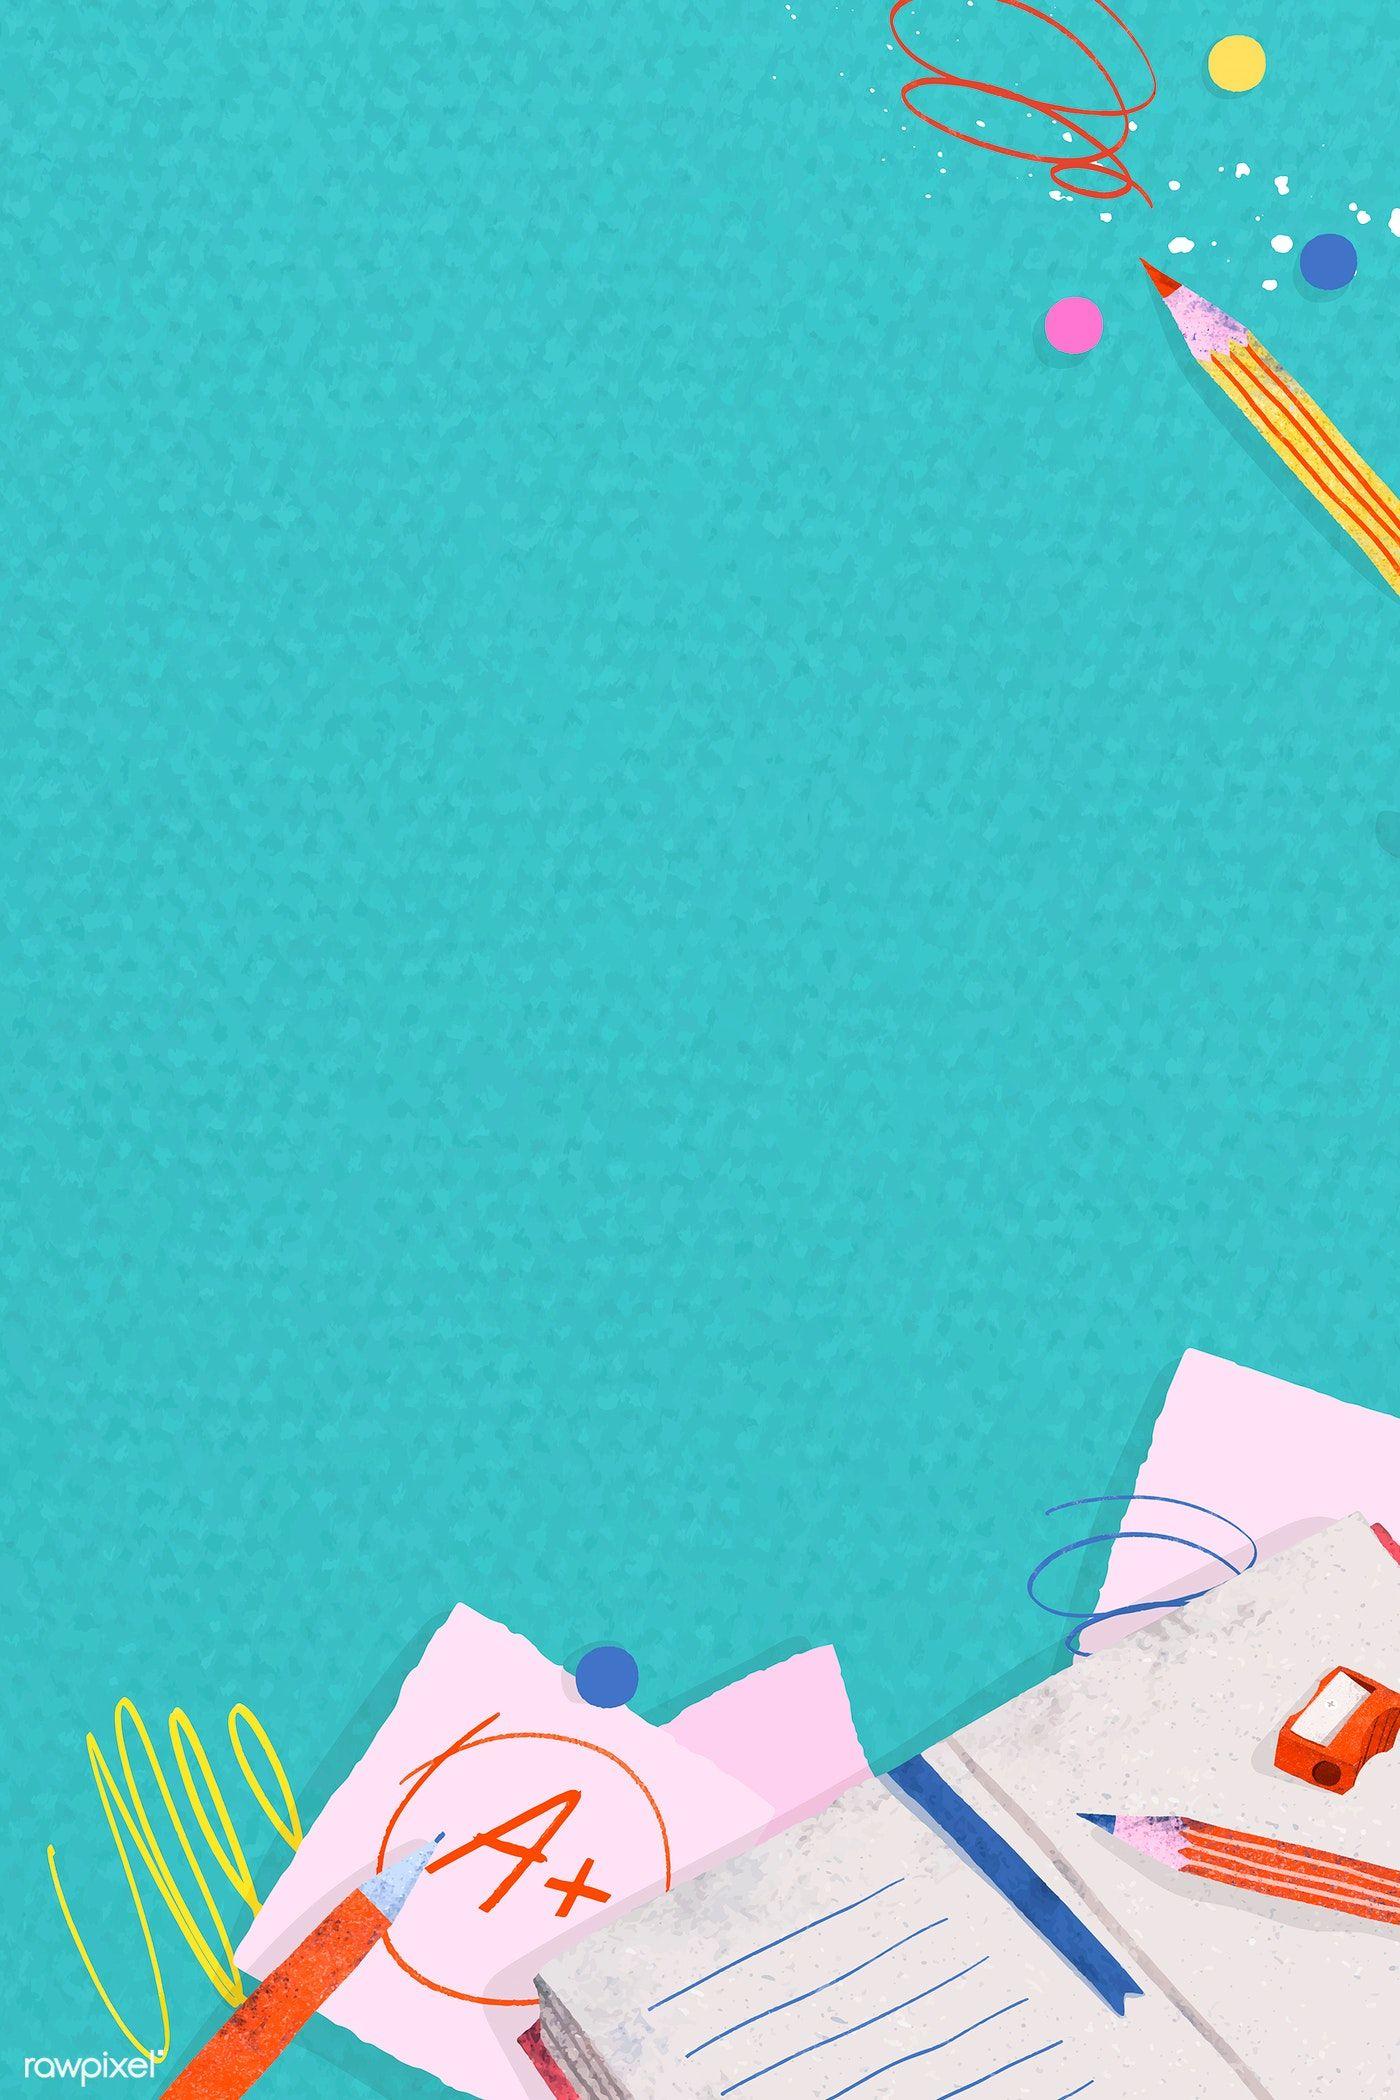 Download Premium Vector Of Green Back To School Frame Vector 1224935 School Frame Back To School Wallpaper School Posters